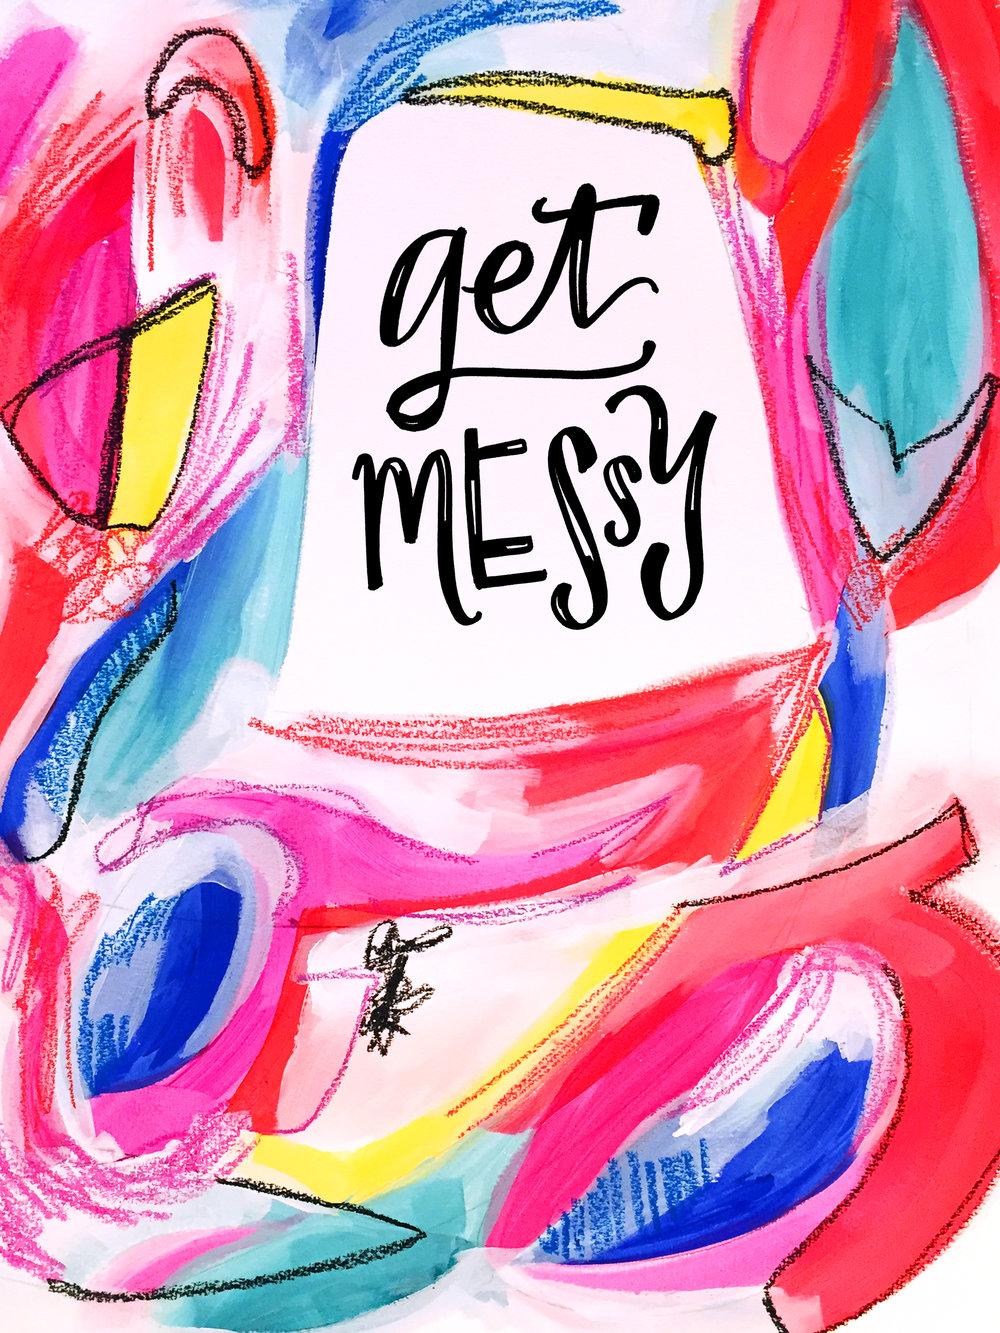 1/30/16: Messy